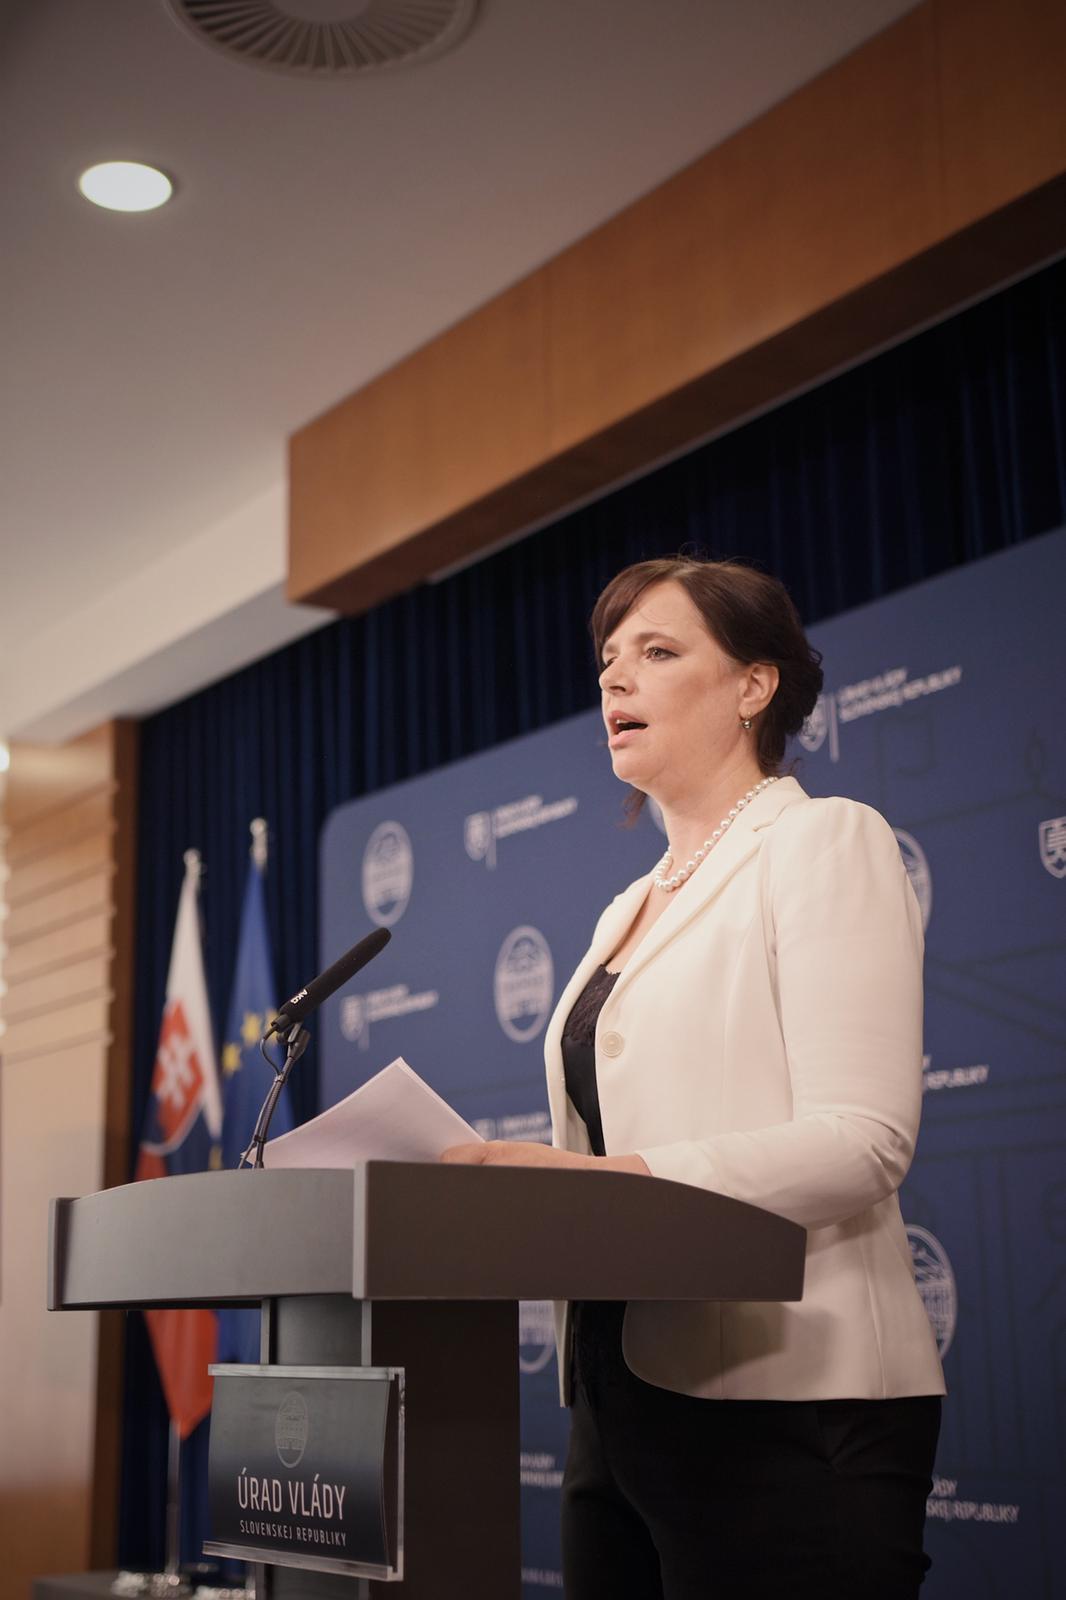 Vicepremiérka Remišová: Utajovaný IT projekt bývalej vlády preverí polícia